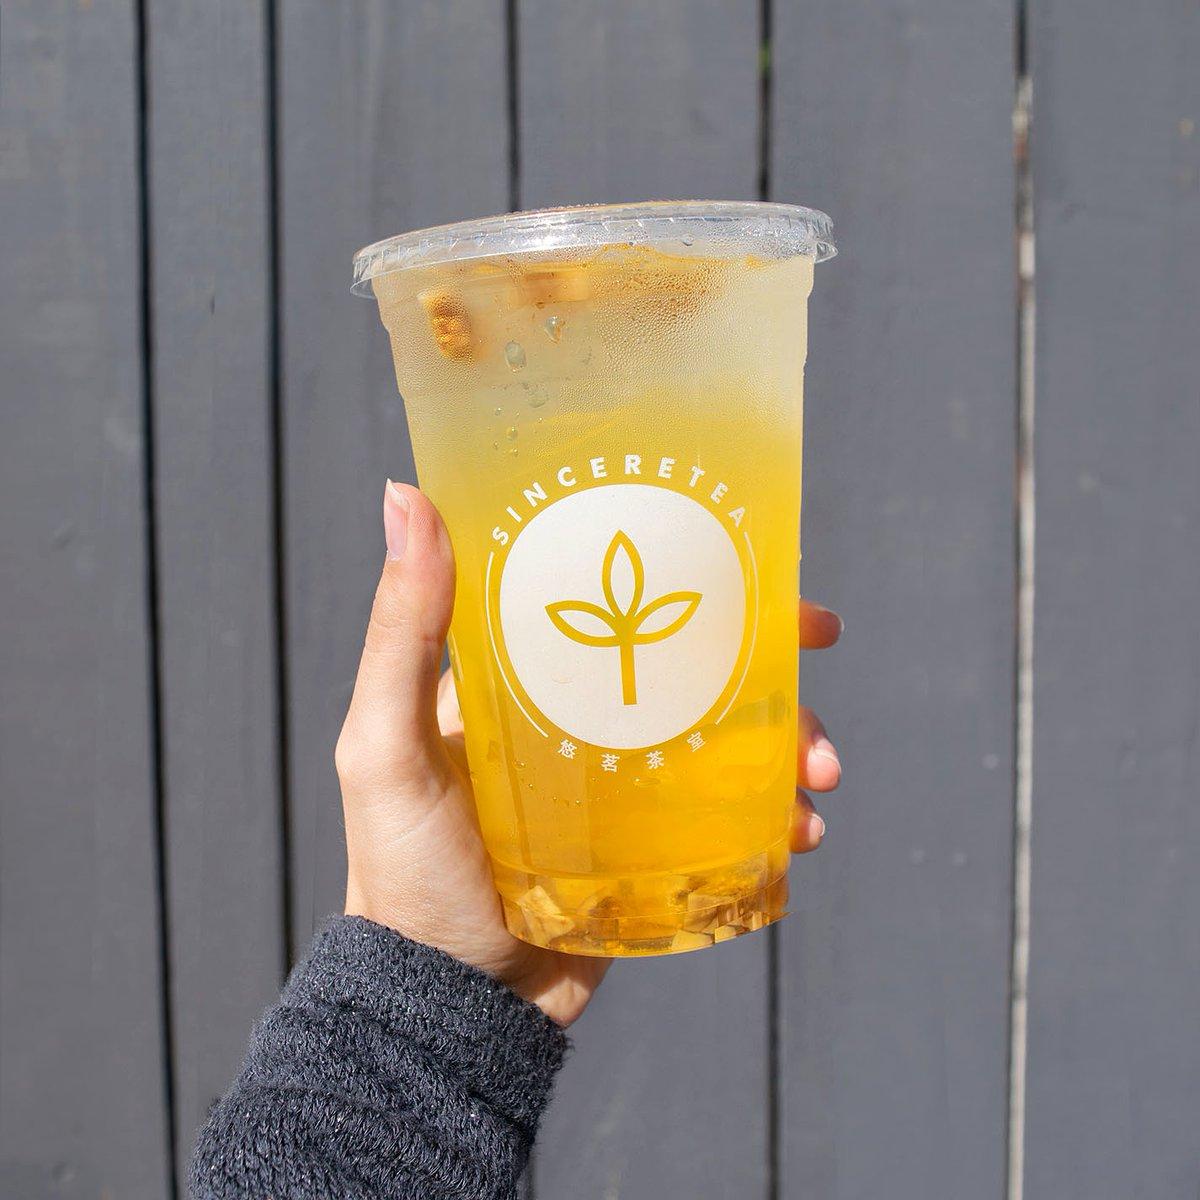 Sunshine in a cup.  . . #spring #seasonal #floral #fruittea #sweettea #chrysanthemum #sinceretea #specialtea #teaaddict #teashop #milktea #boba #bobamilktea #march #happinessinacup #lychee #fig #yellow #downtownwalnutcreek #downtownsjpic.twitter.com/55ubEc2F5x